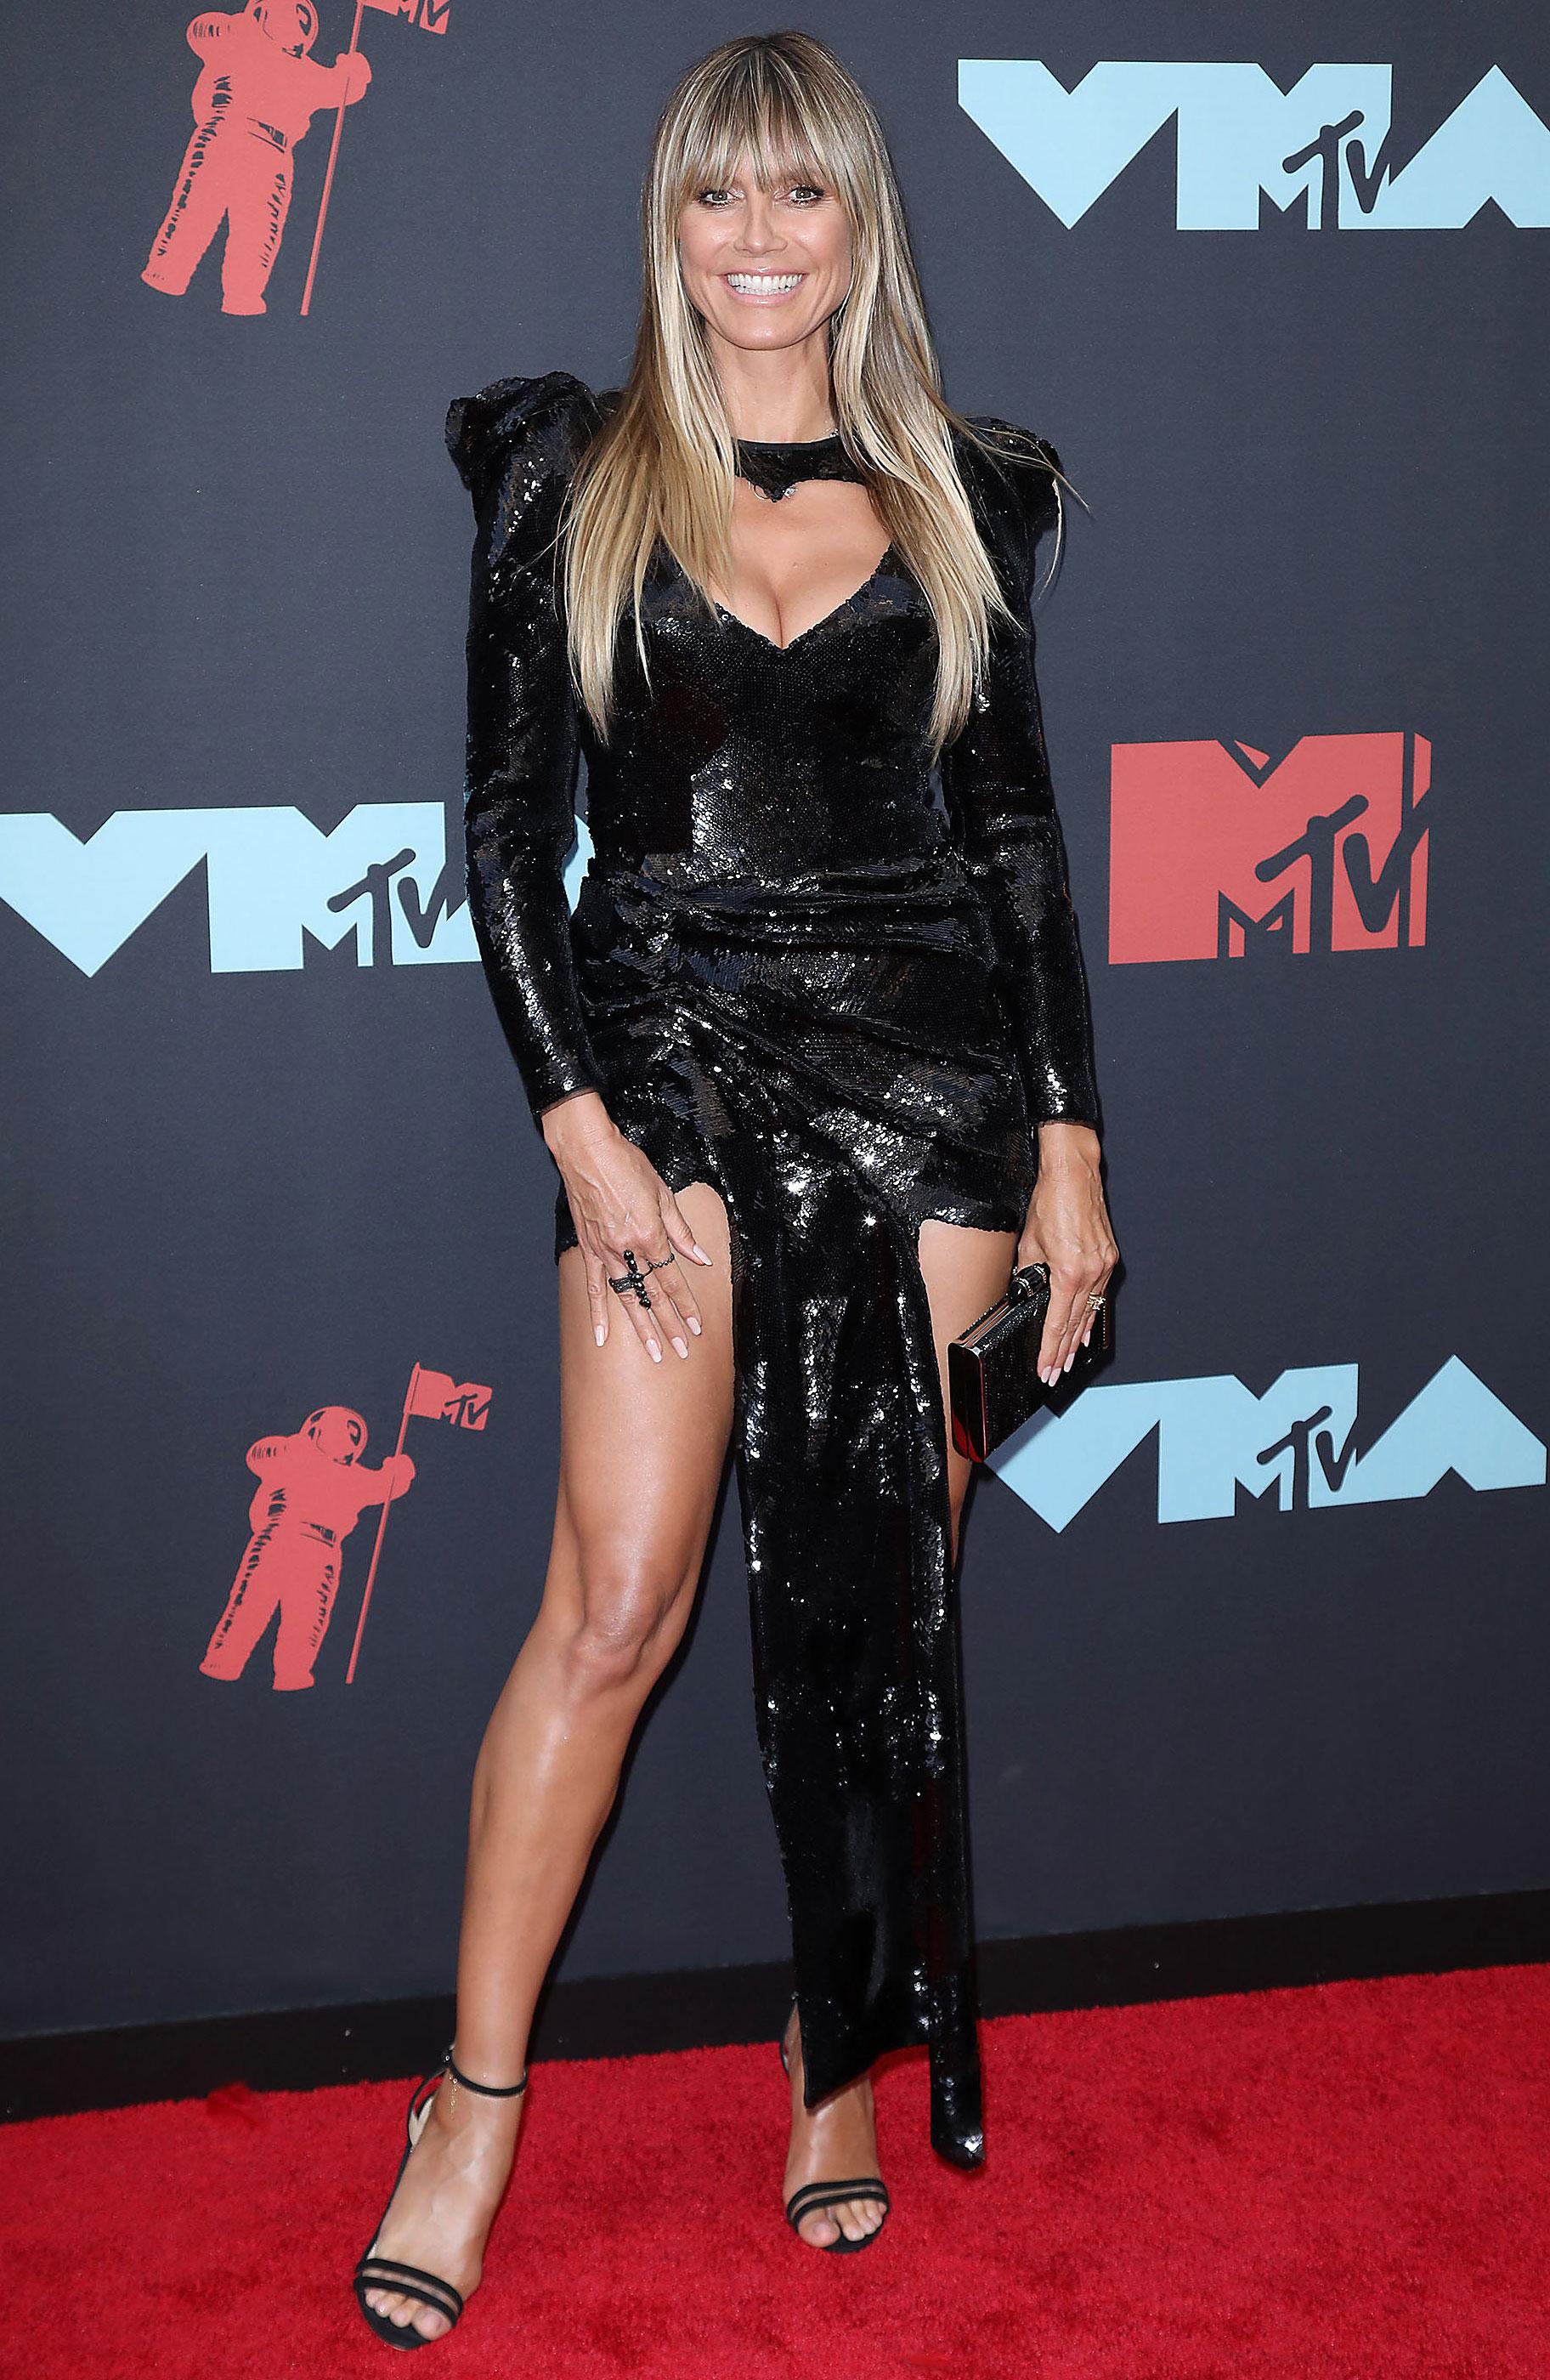 https://www.usmagazine.com/wp content/uploads/2019/08/VMAS 2019 Heidi Klum